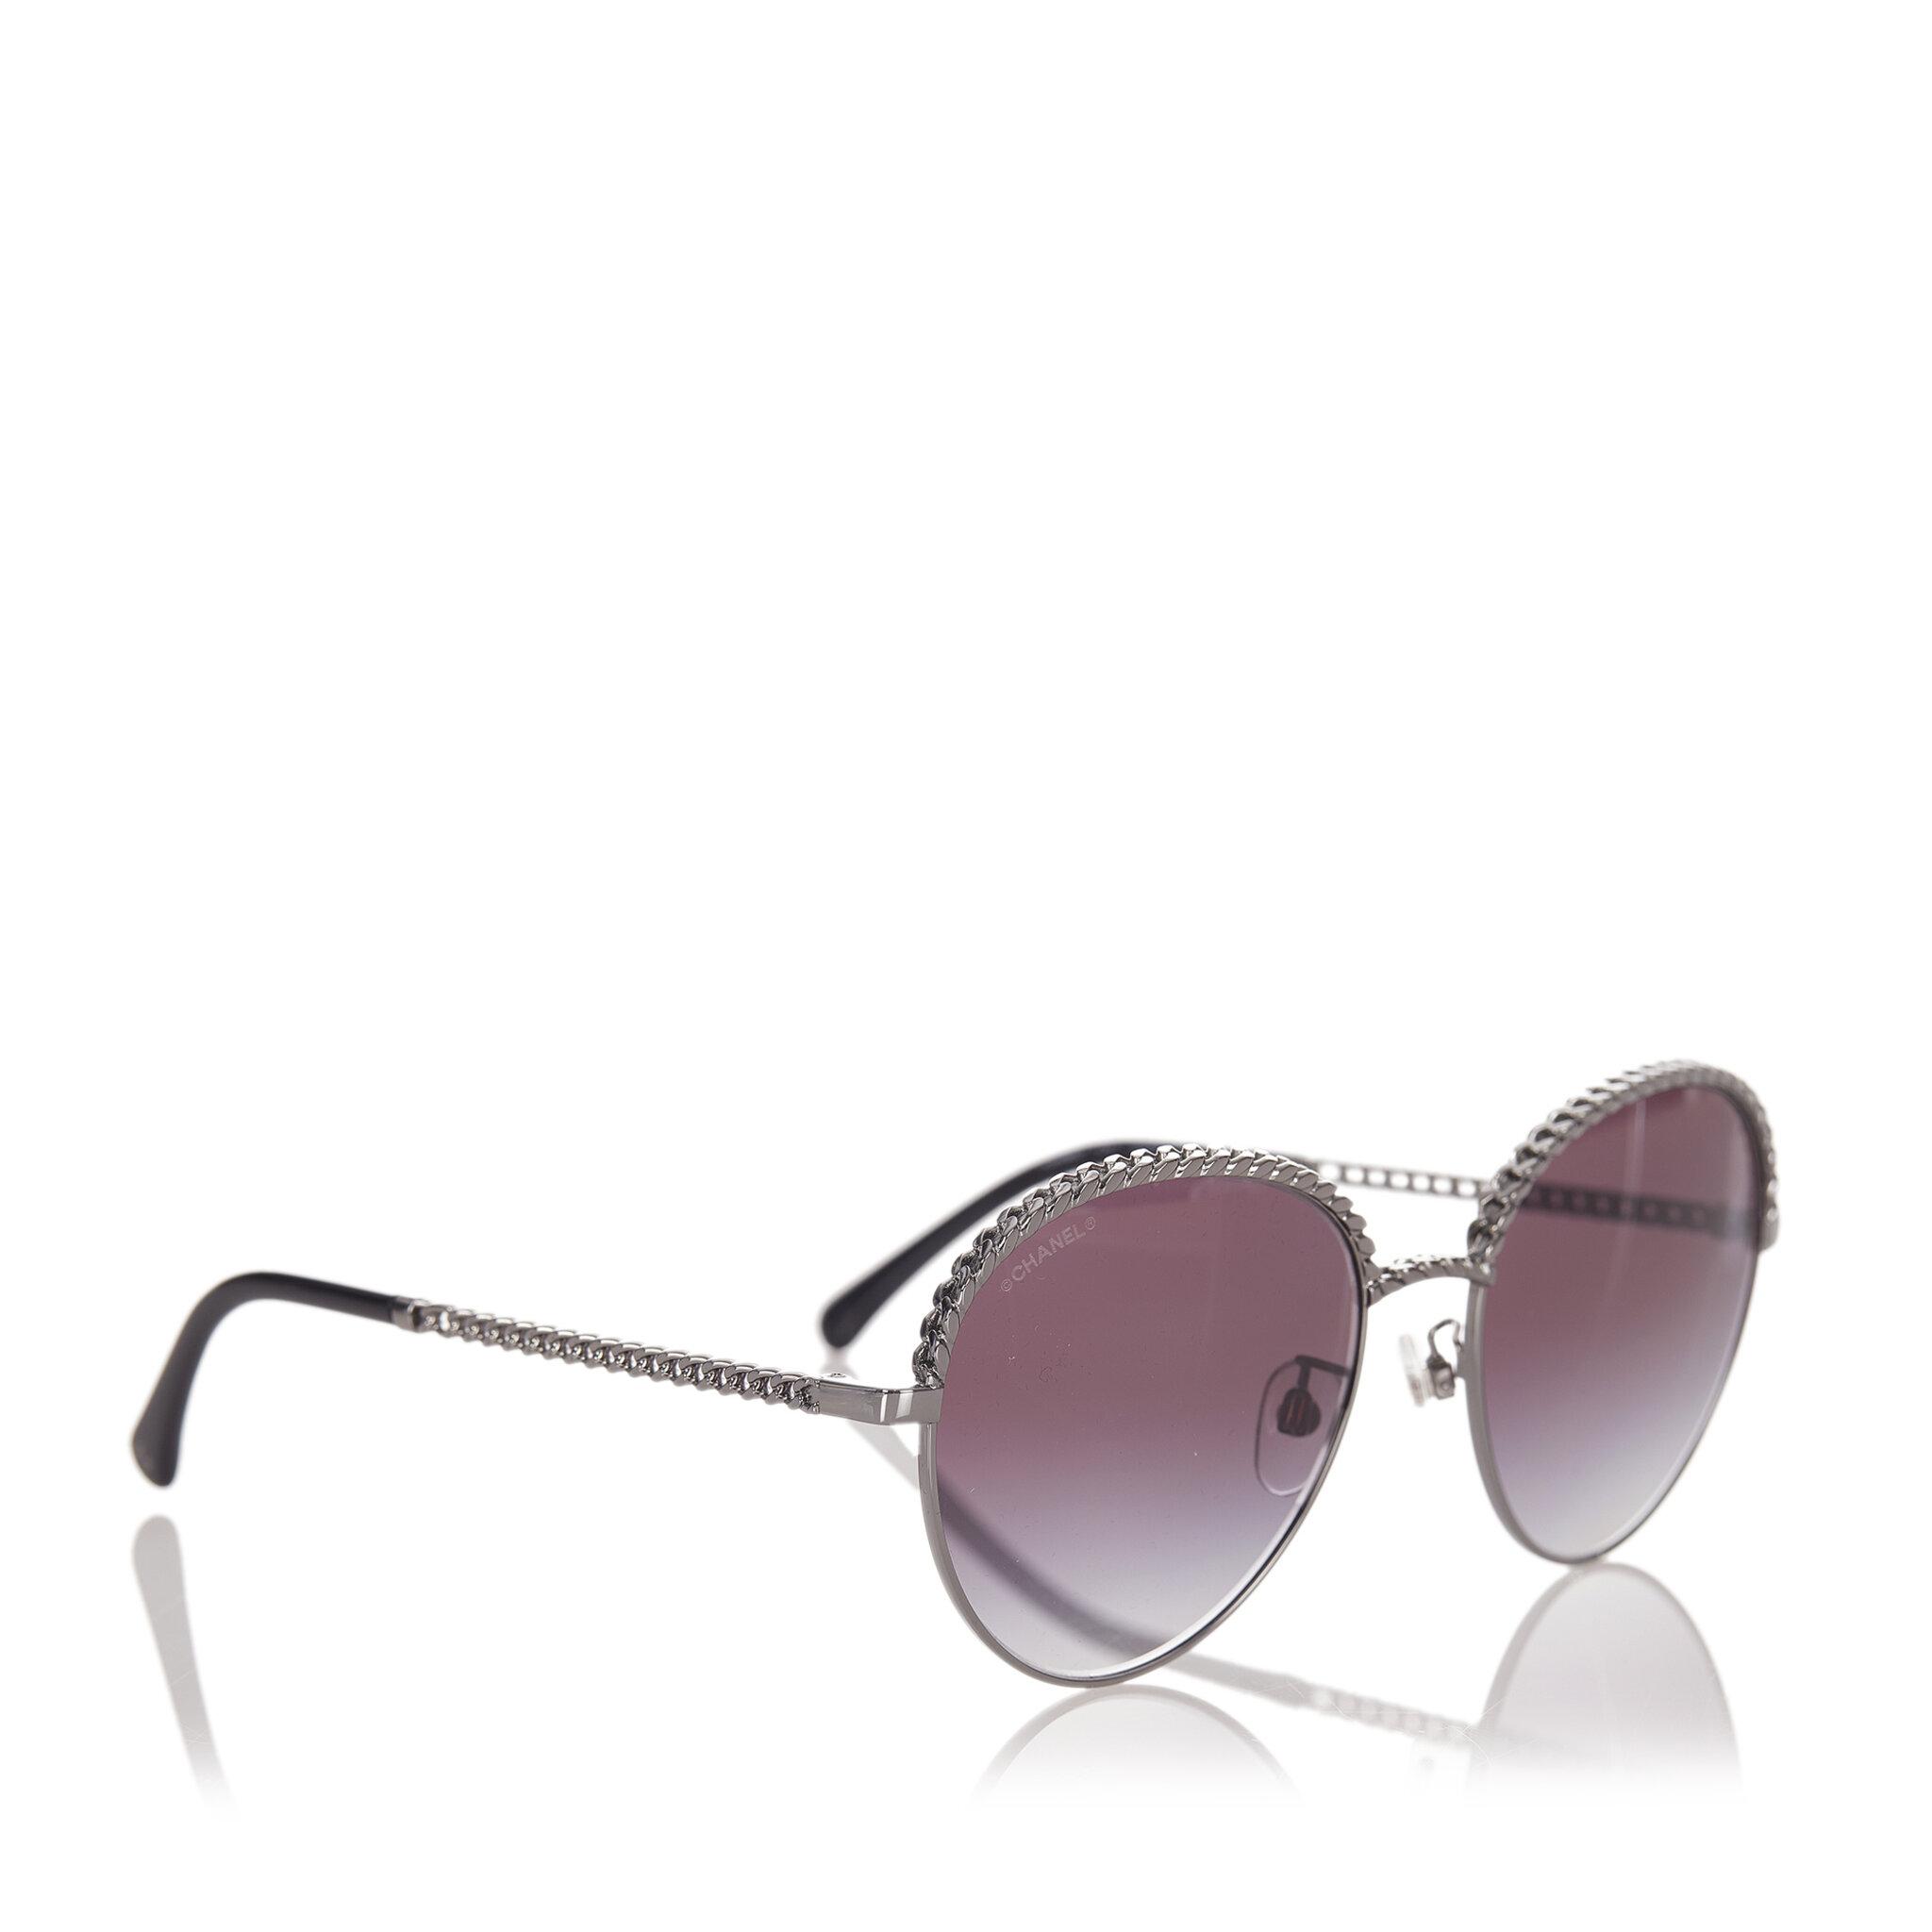 Chanel Round Tinted Sunglasses, ONESIZE